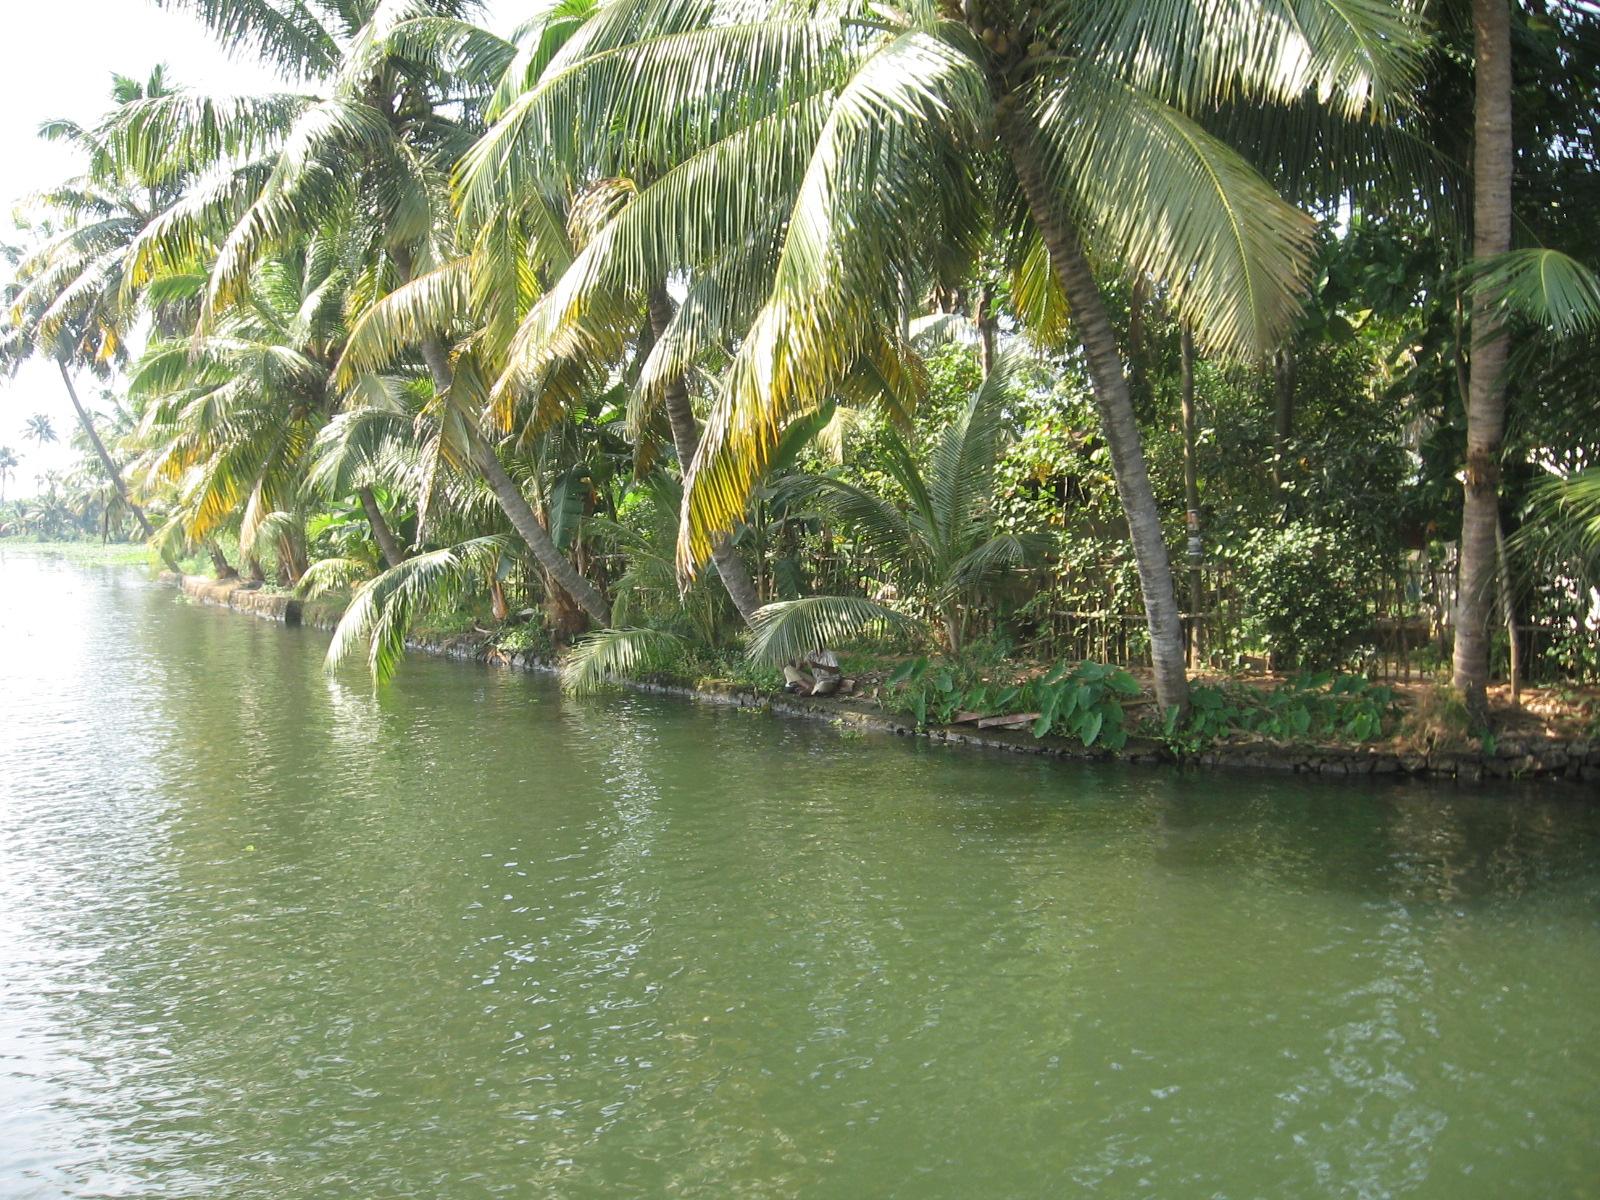 Kerala Backwaters - Places to Visit in Kerala